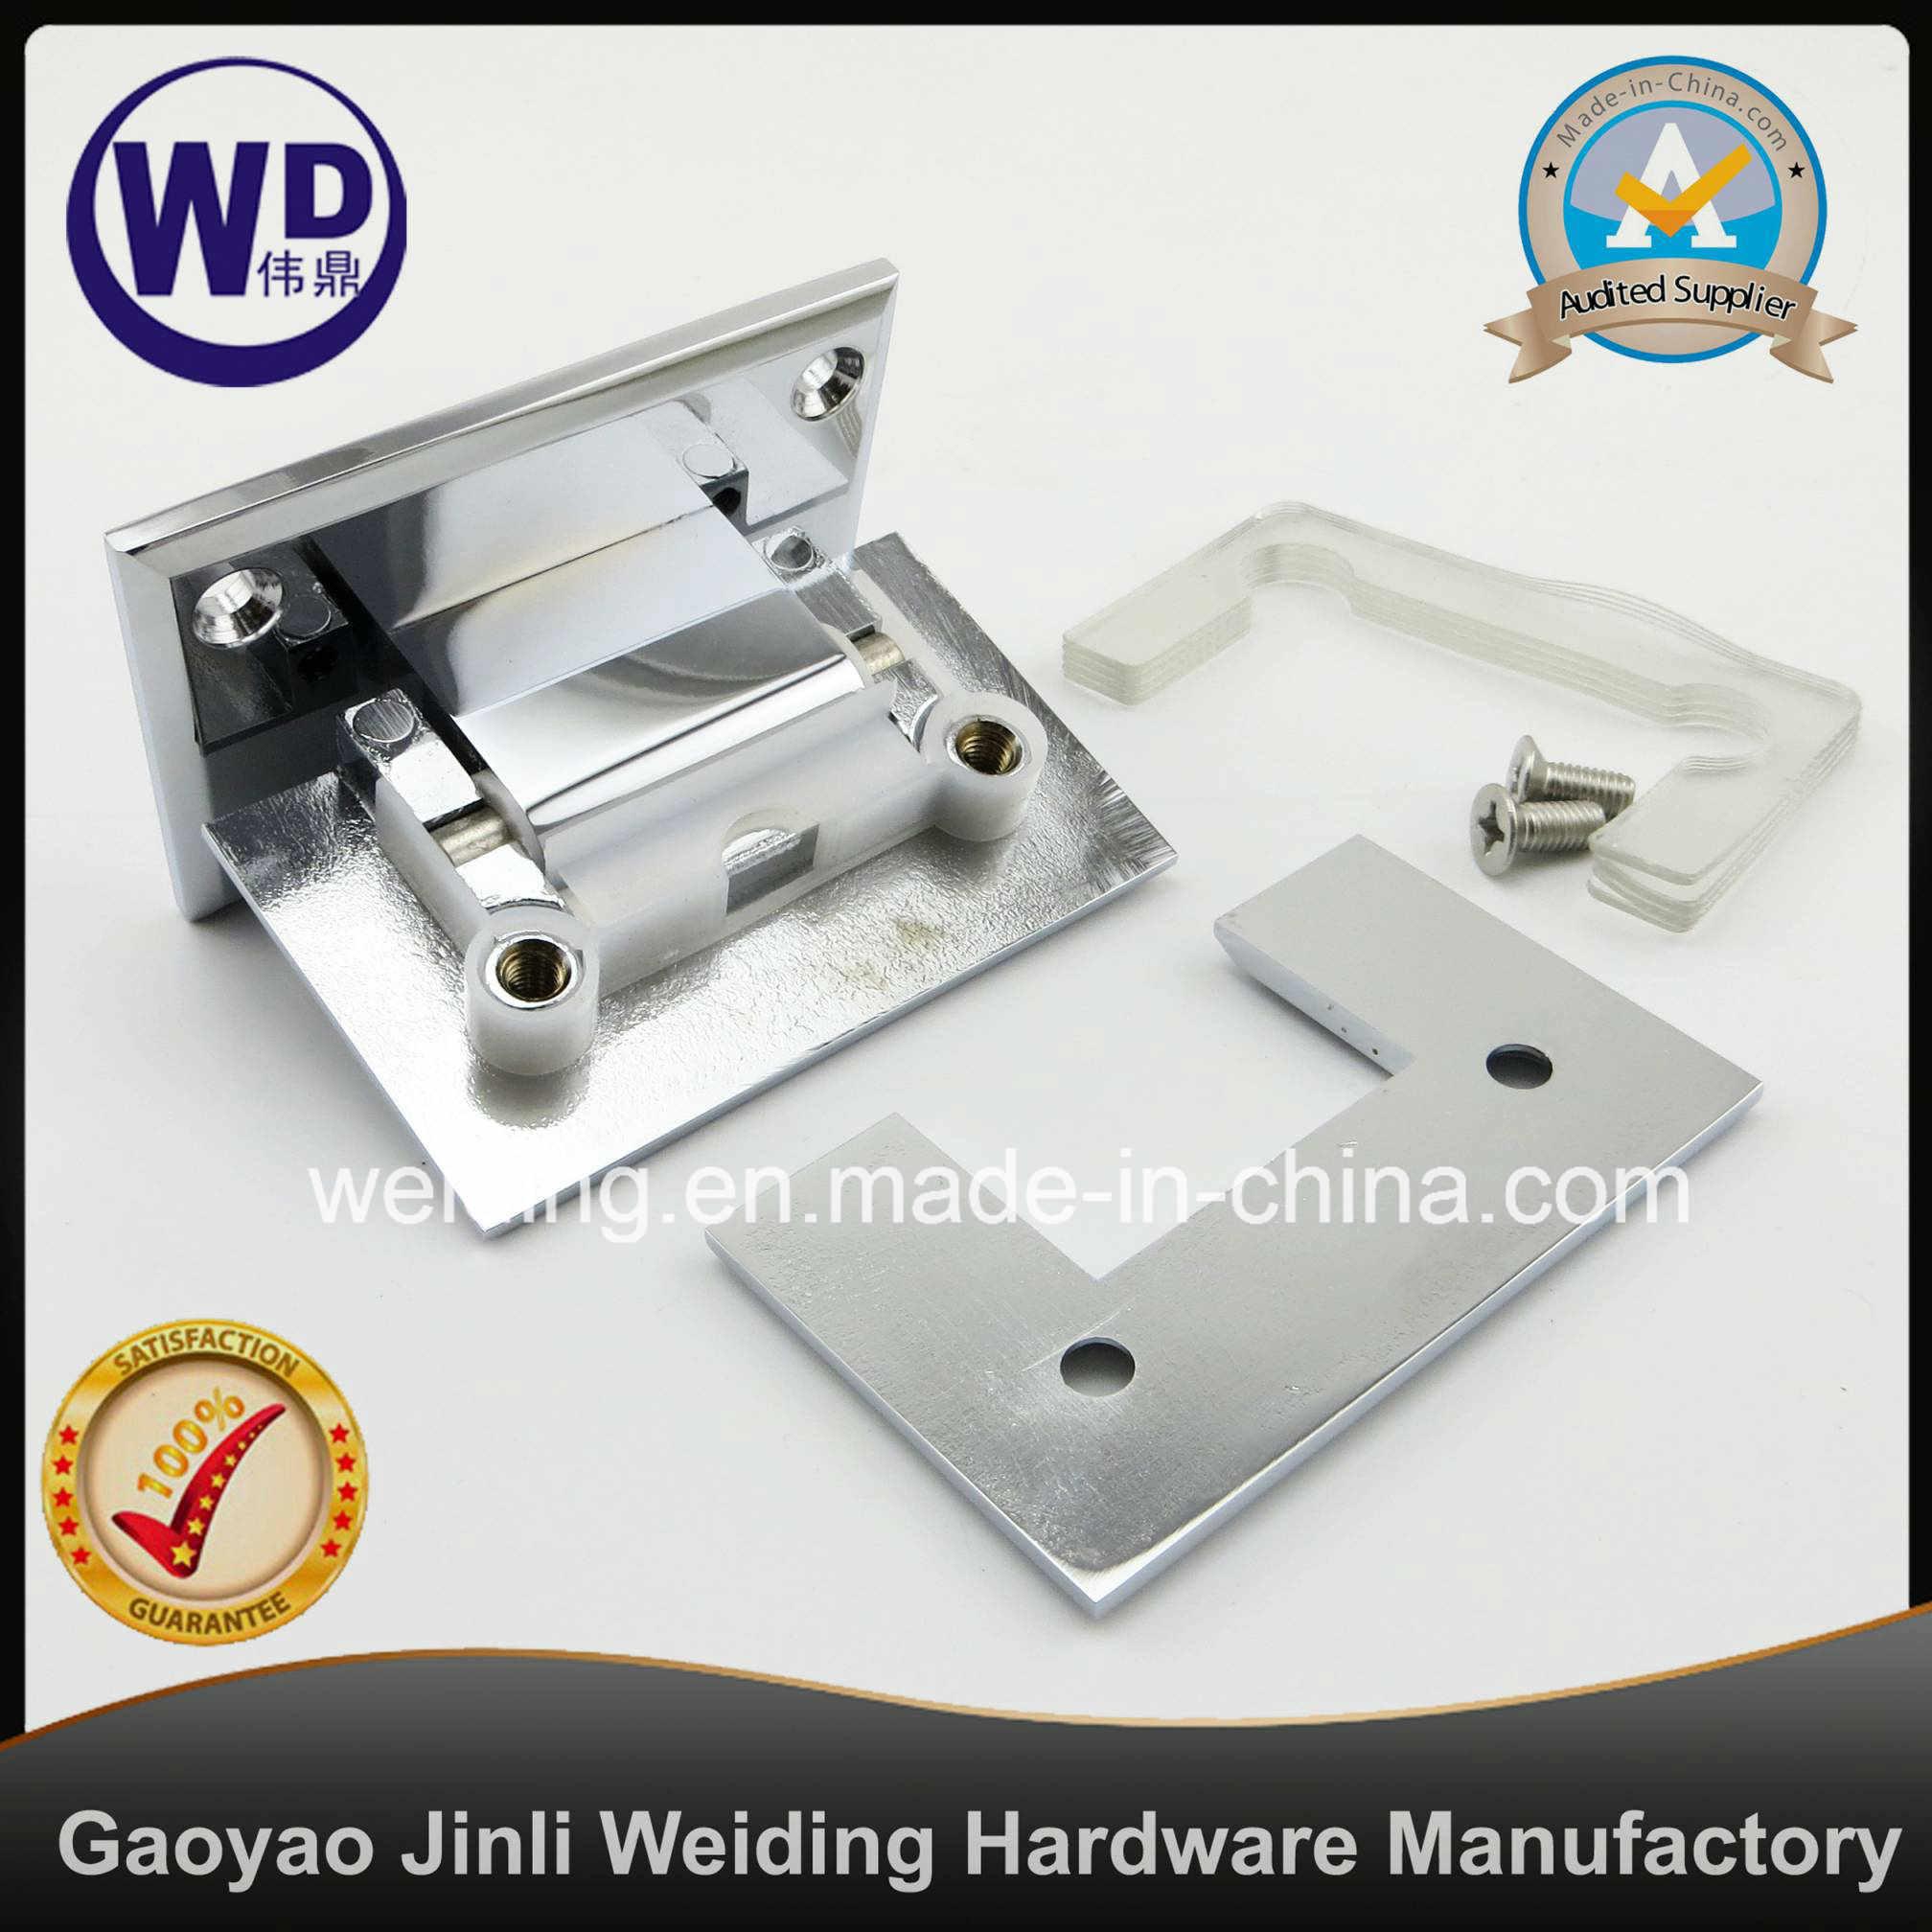 Standard Duty Glass Mount Shower Hinge/ Wt-5703h